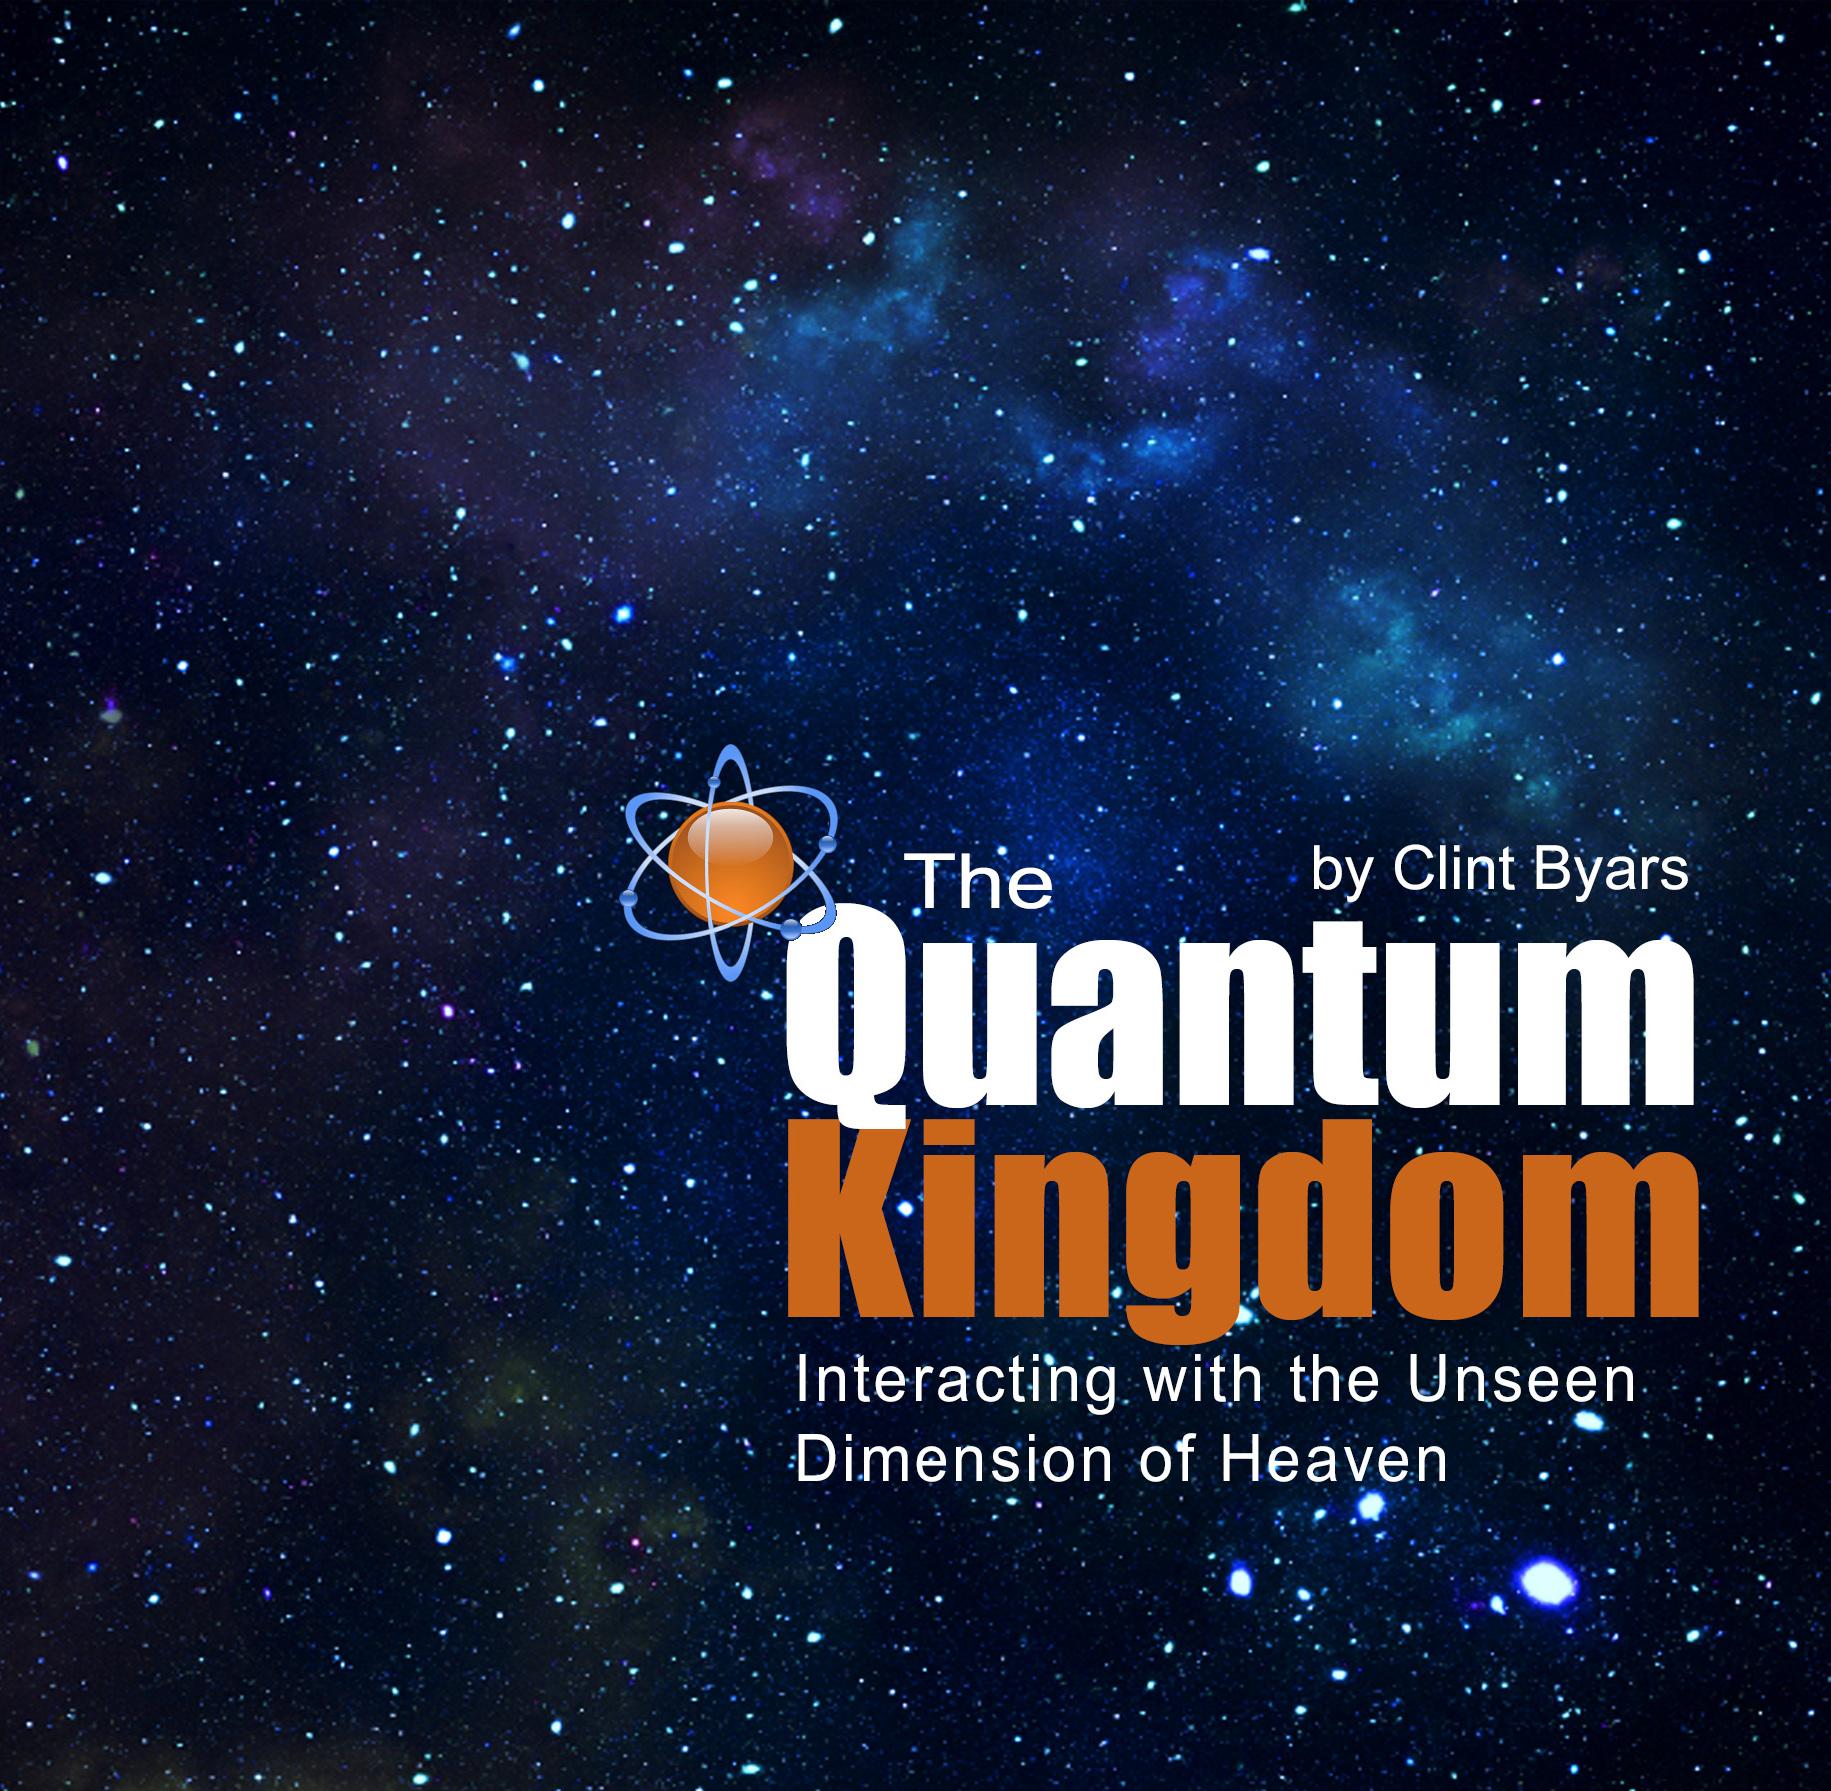 The Quantum Kingdom front.jpg